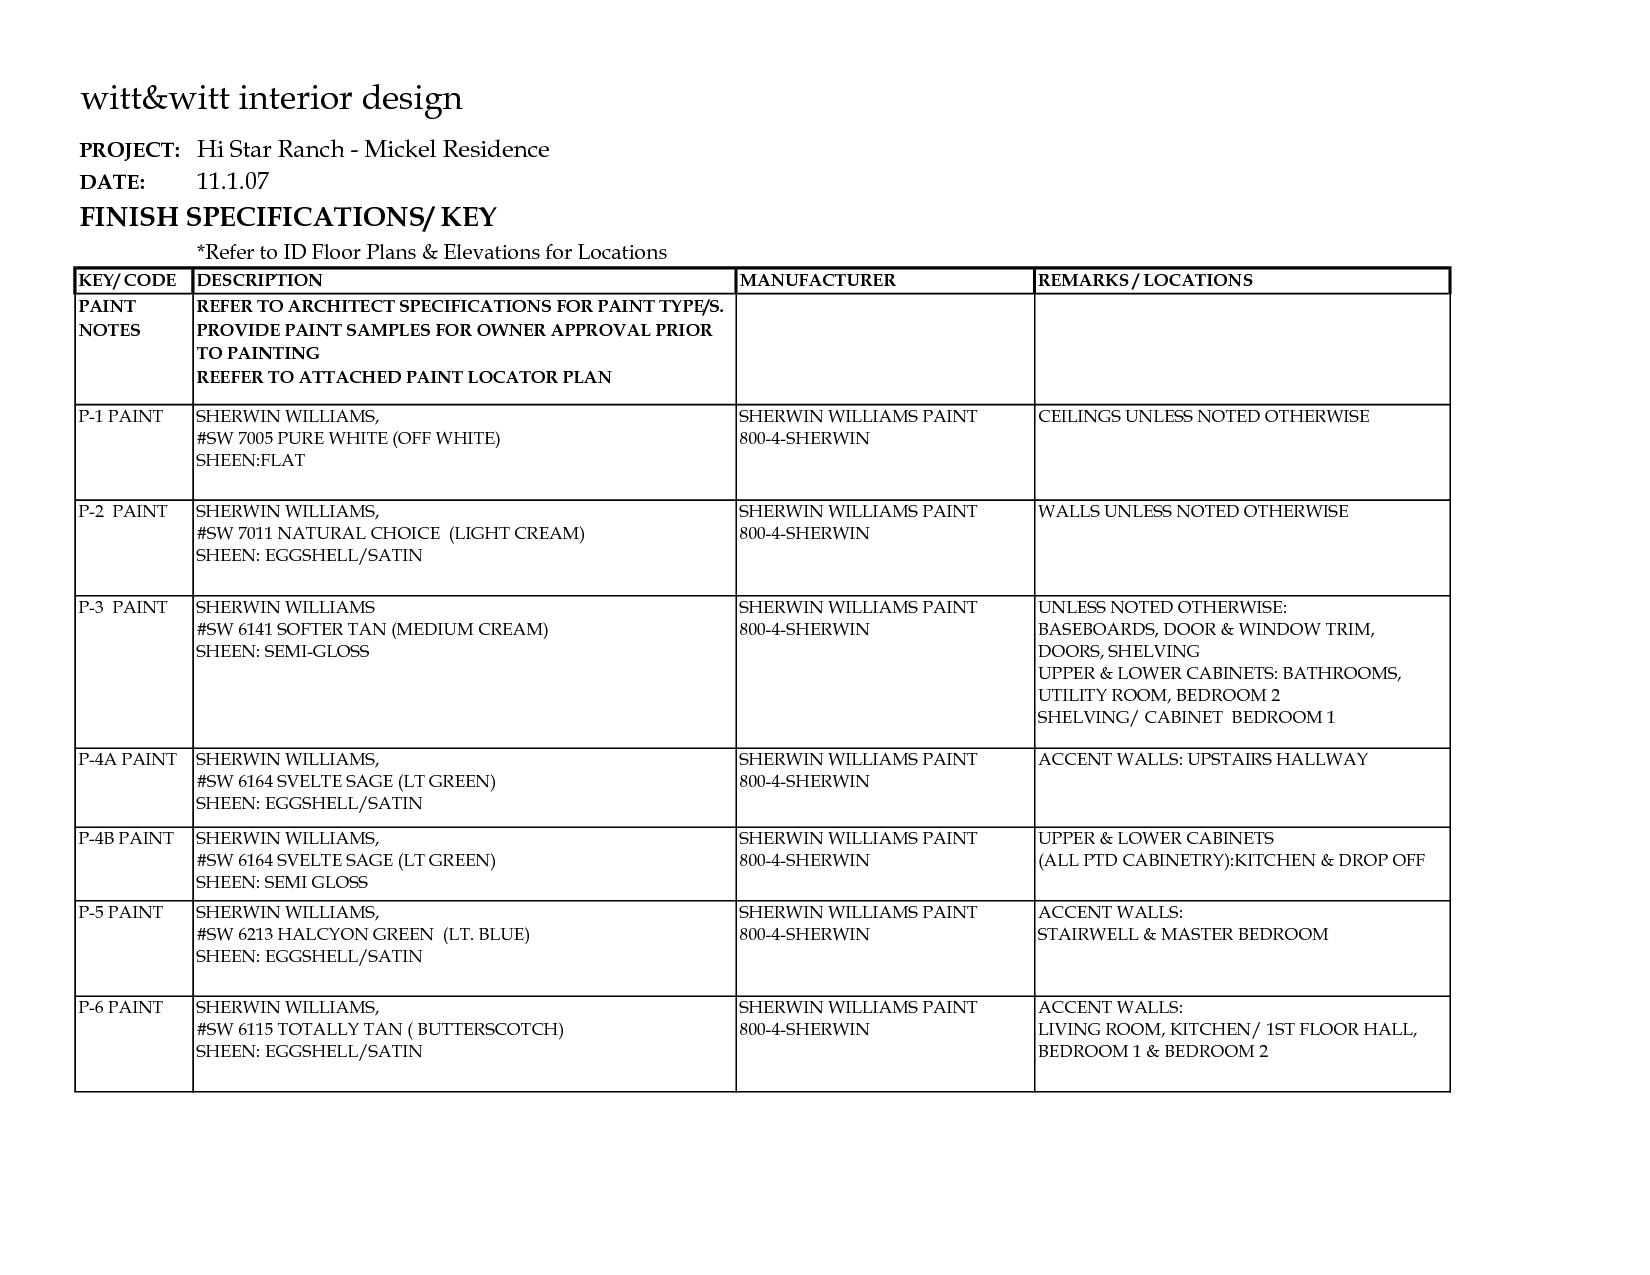 Interior Finish Schedule Template In